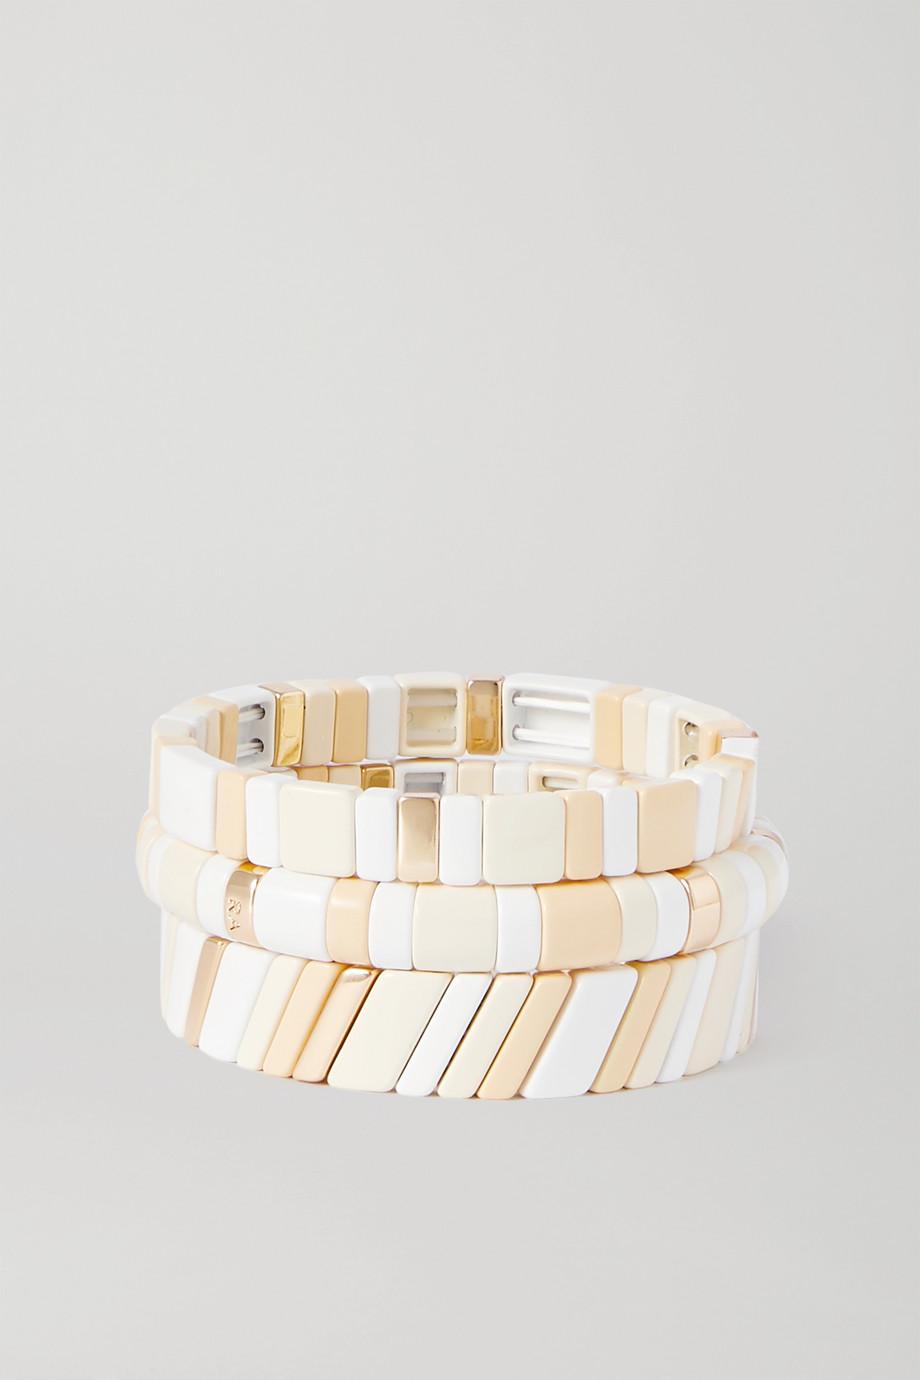 Roxanne Assoulin Triple Creme 搪瓷金色手镯(三枚装)